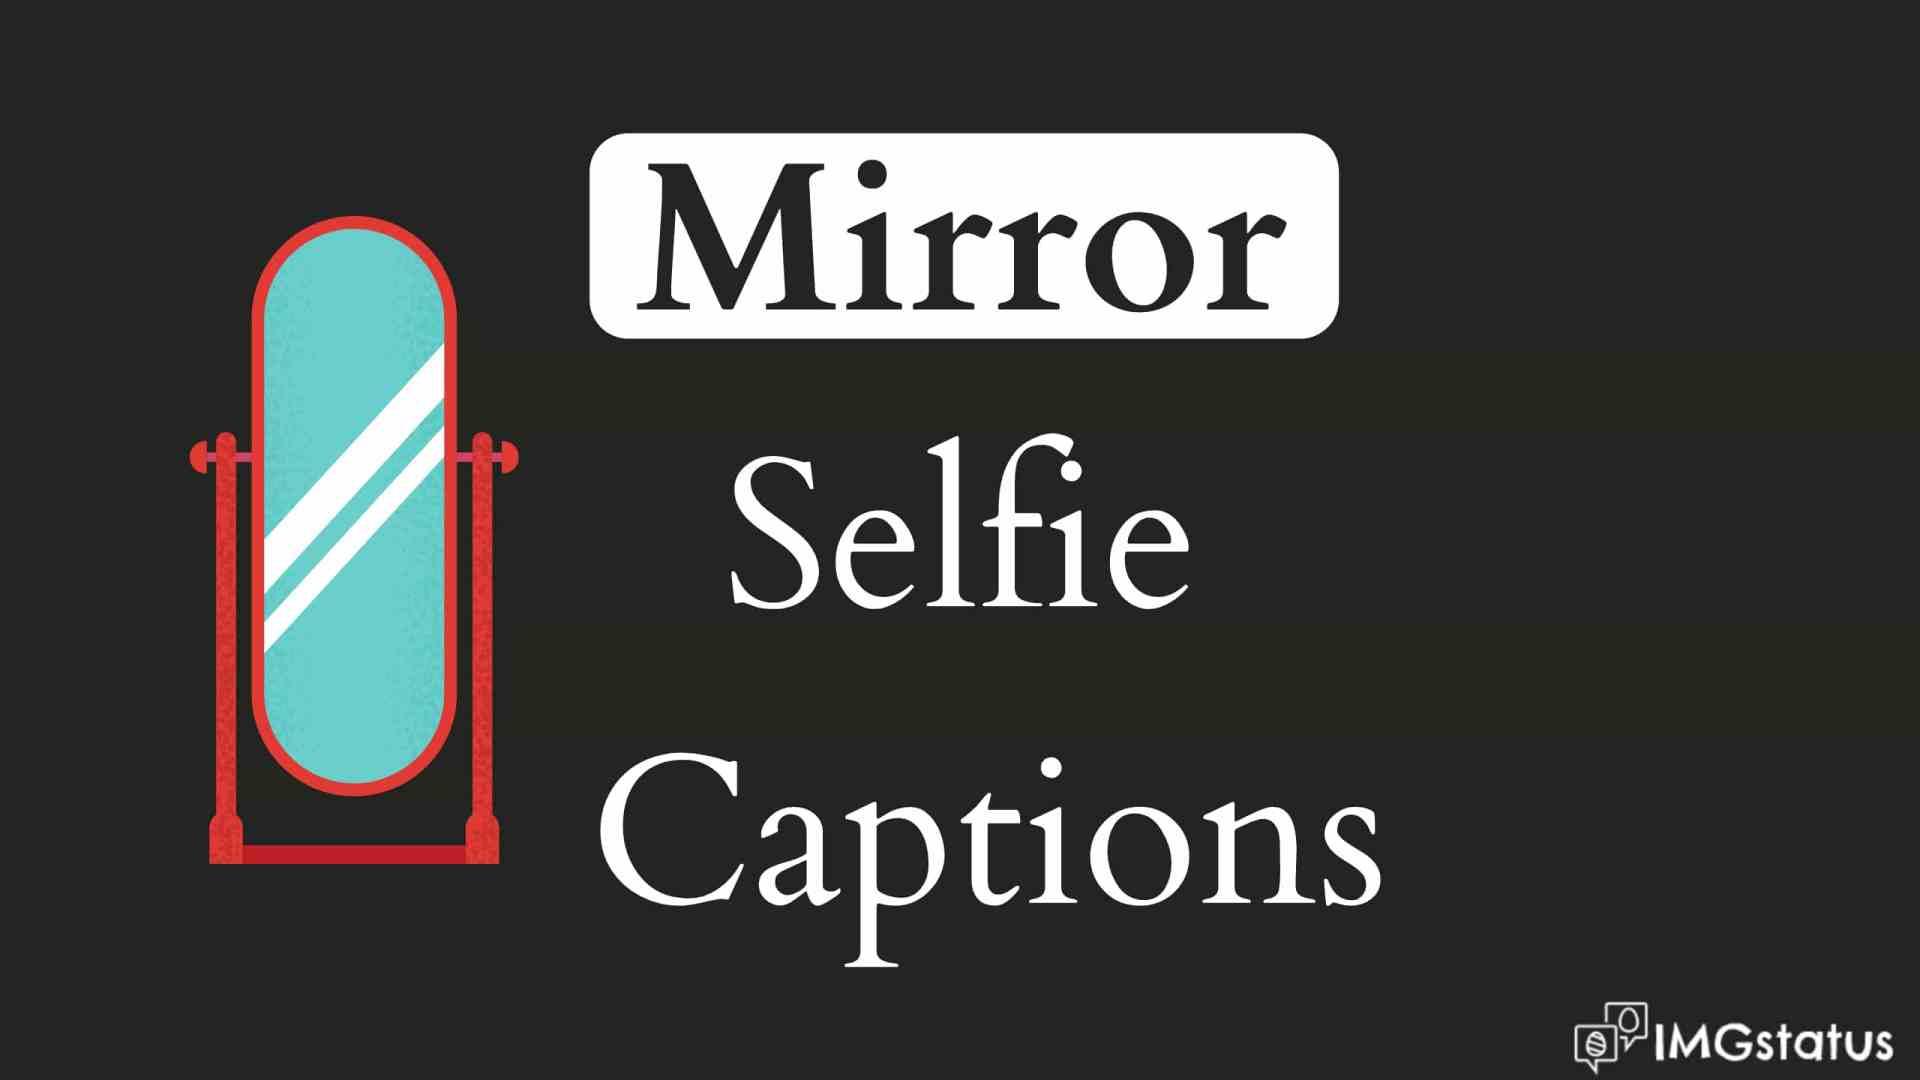 Best Mirror Selfie Captions for Instagram - Boys & Girls (2021)